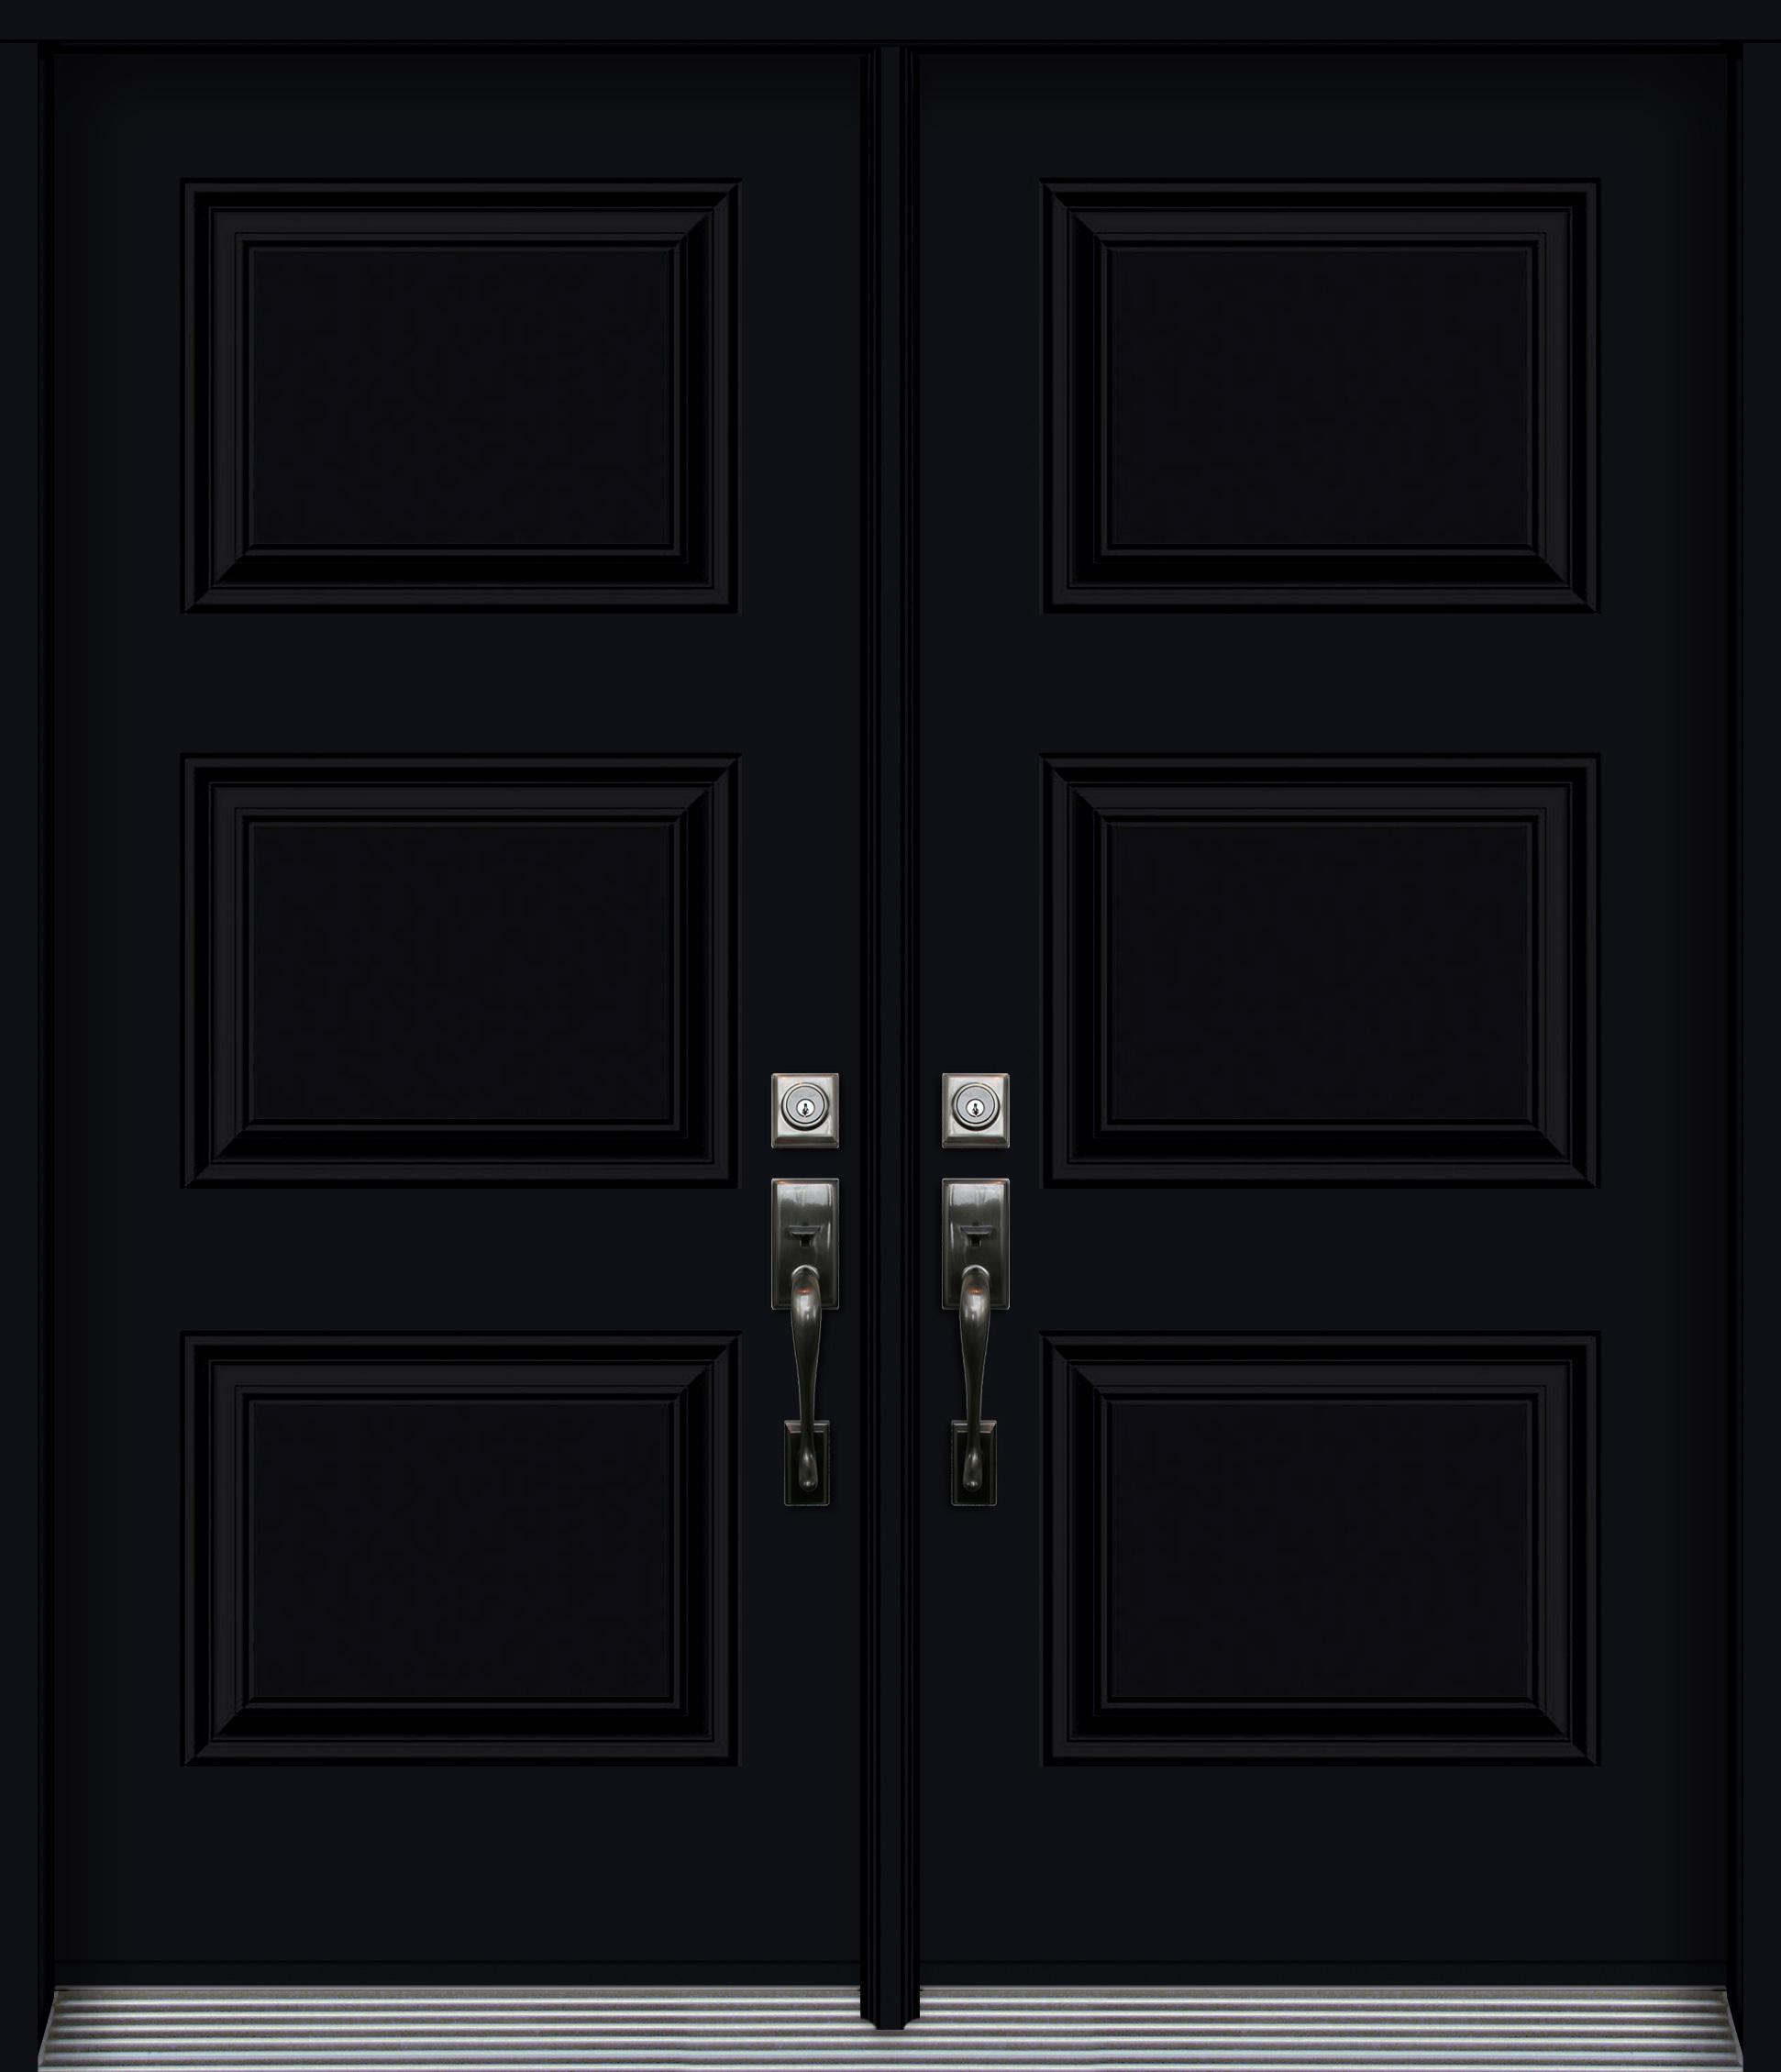 Pa3p Syd Double Embossed Steel Door 3 Panels Black